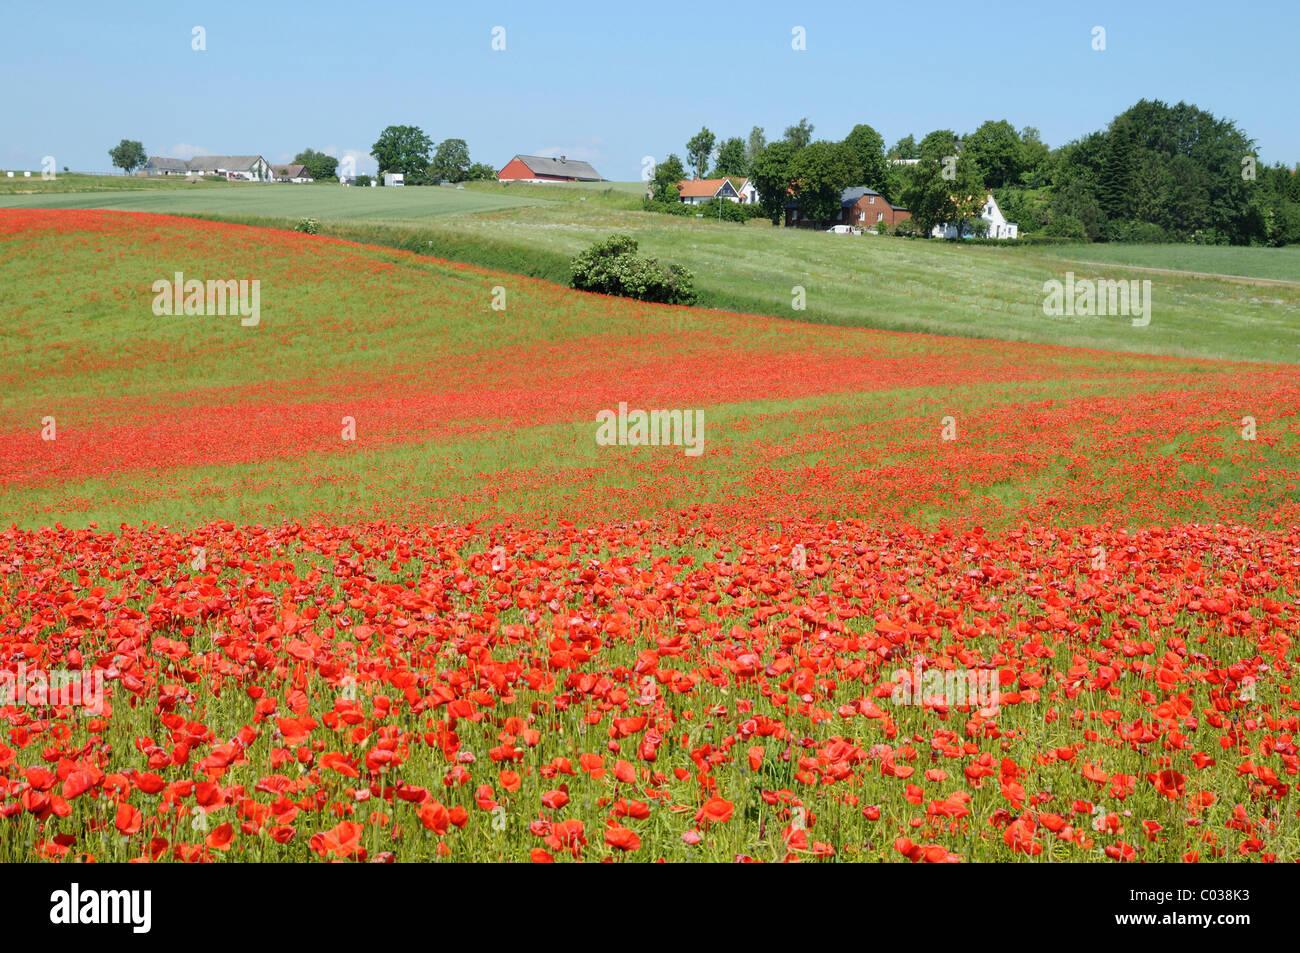 Paesaggio con poppyfield, Bjaeresjoe, Skåne, Svezia, Europa Immagini Stock